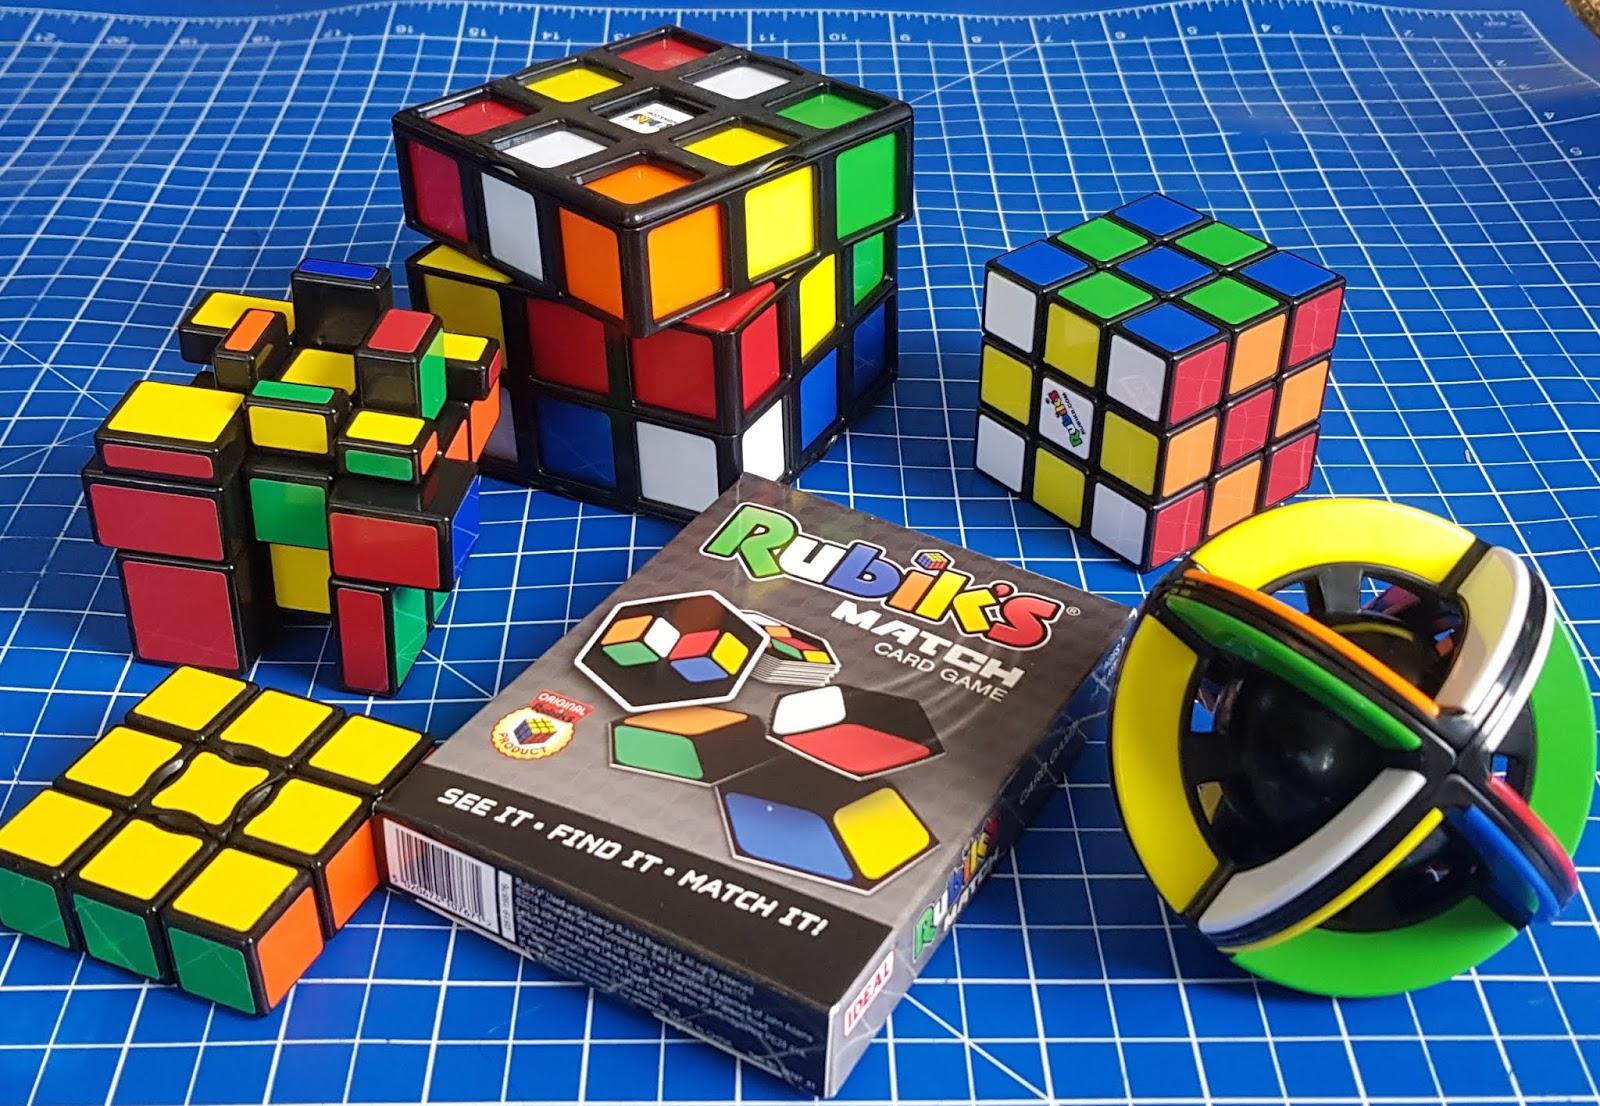 The Brick Castle: Rubik's Summer Scrambles Games Review (Age